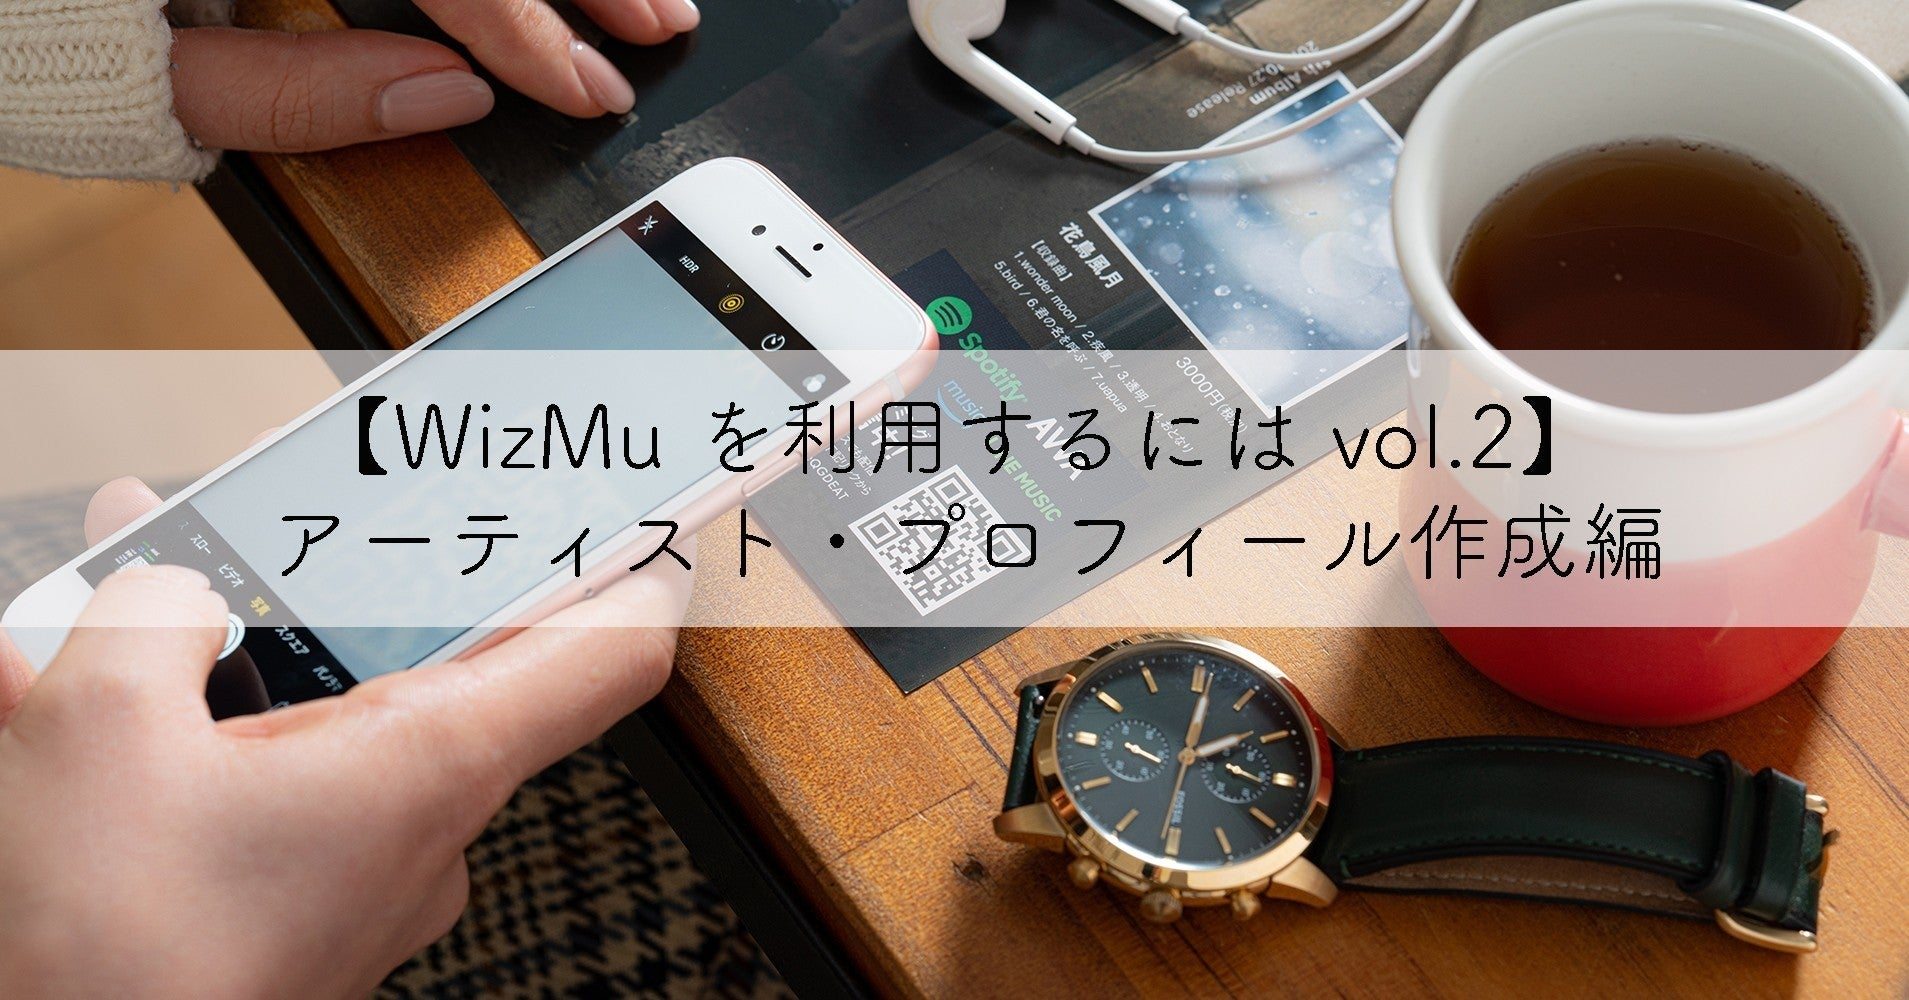 【WizMu を利用するには vol.2】 アーティスト・プロフィール作成編